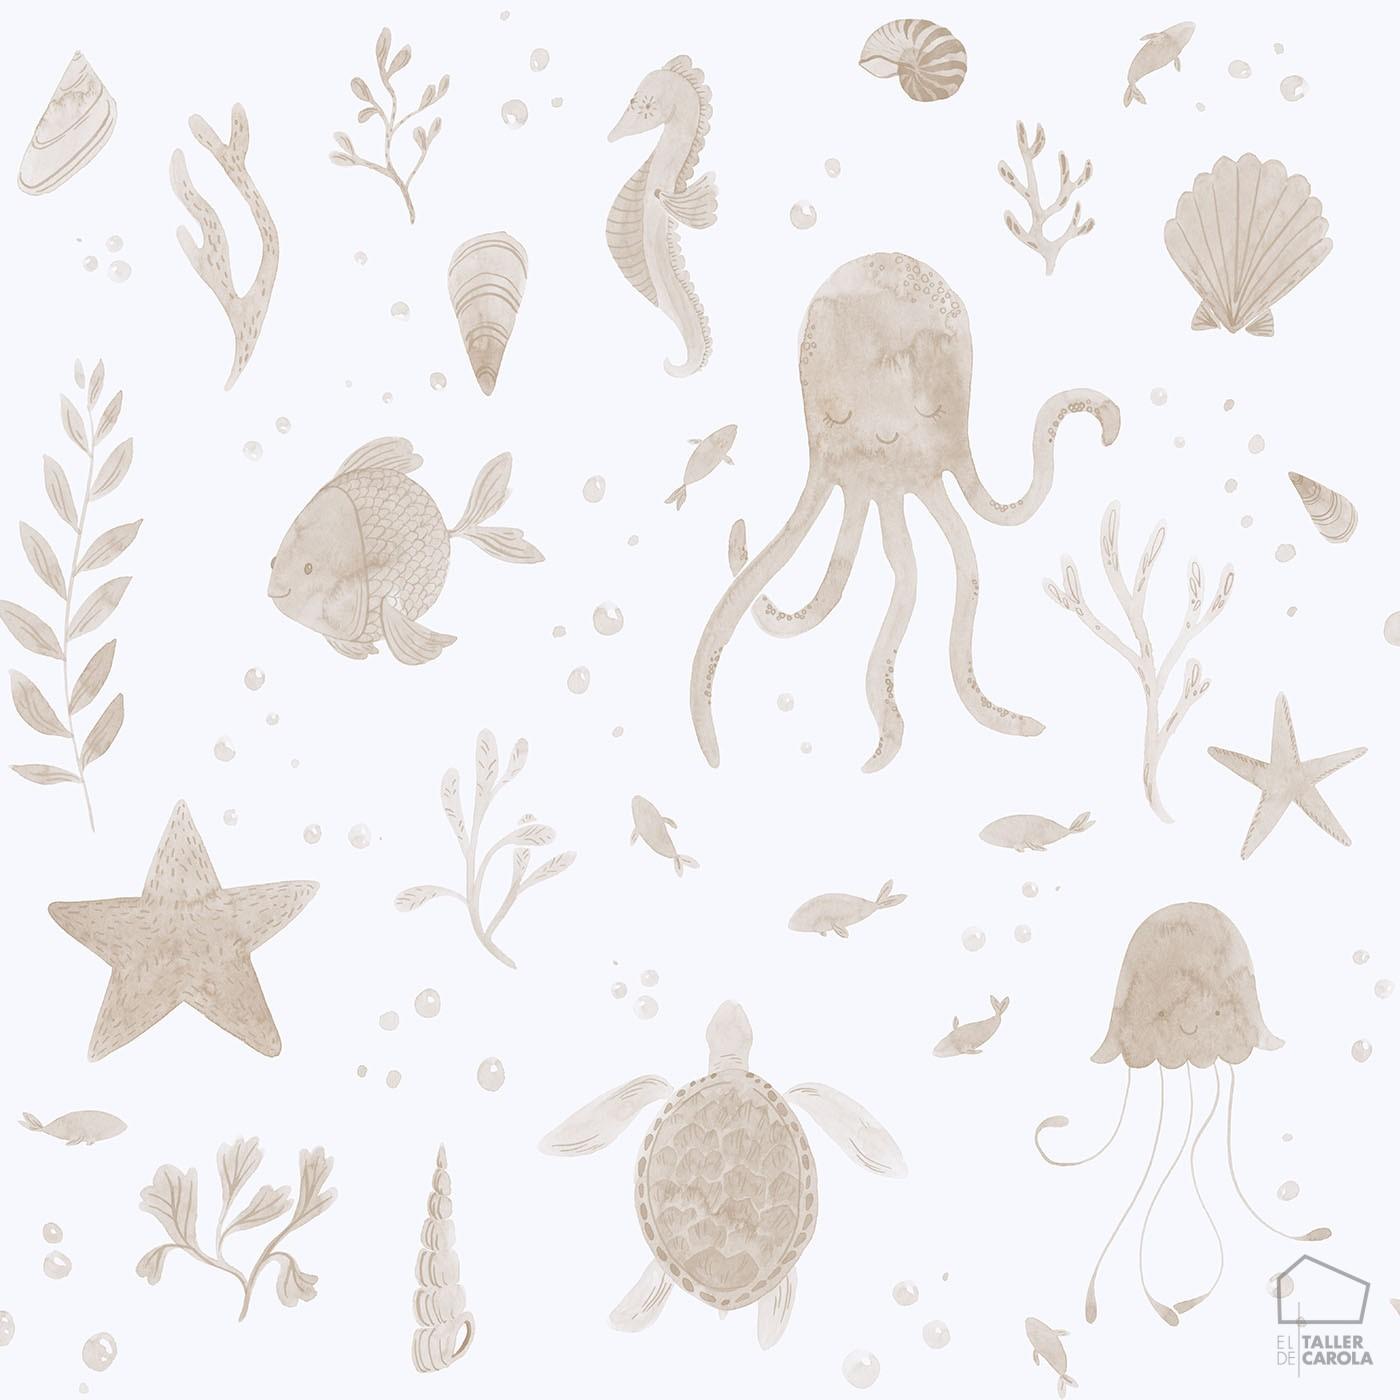 059fam2-del243-23-papel-pintado-infantil-fondo-marino-nude-1